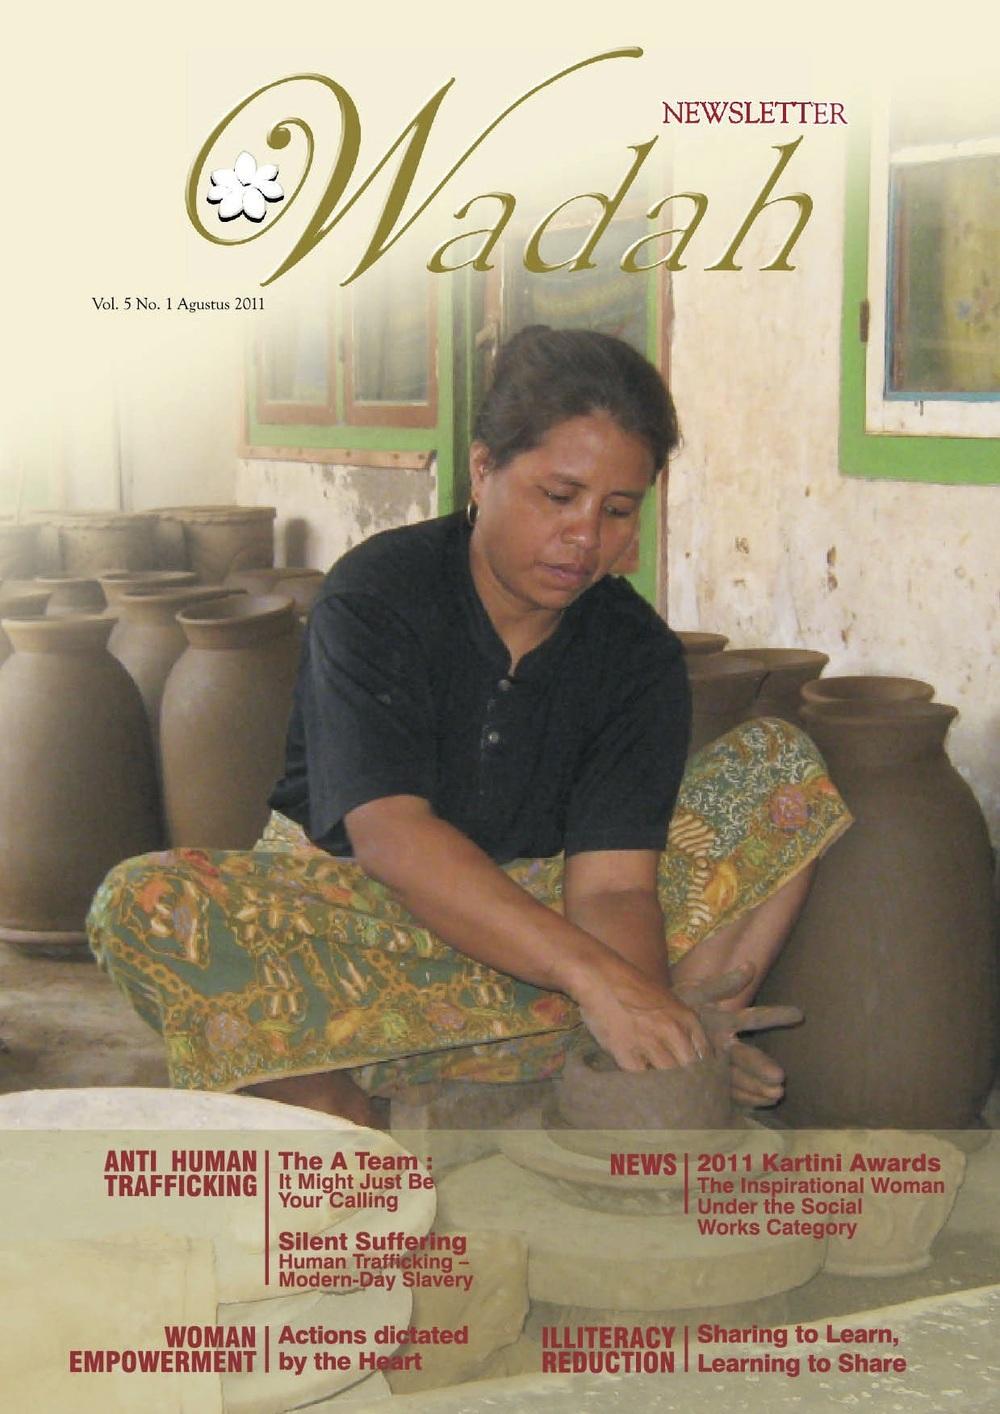 Vol. 4 No. 2 - August 2011